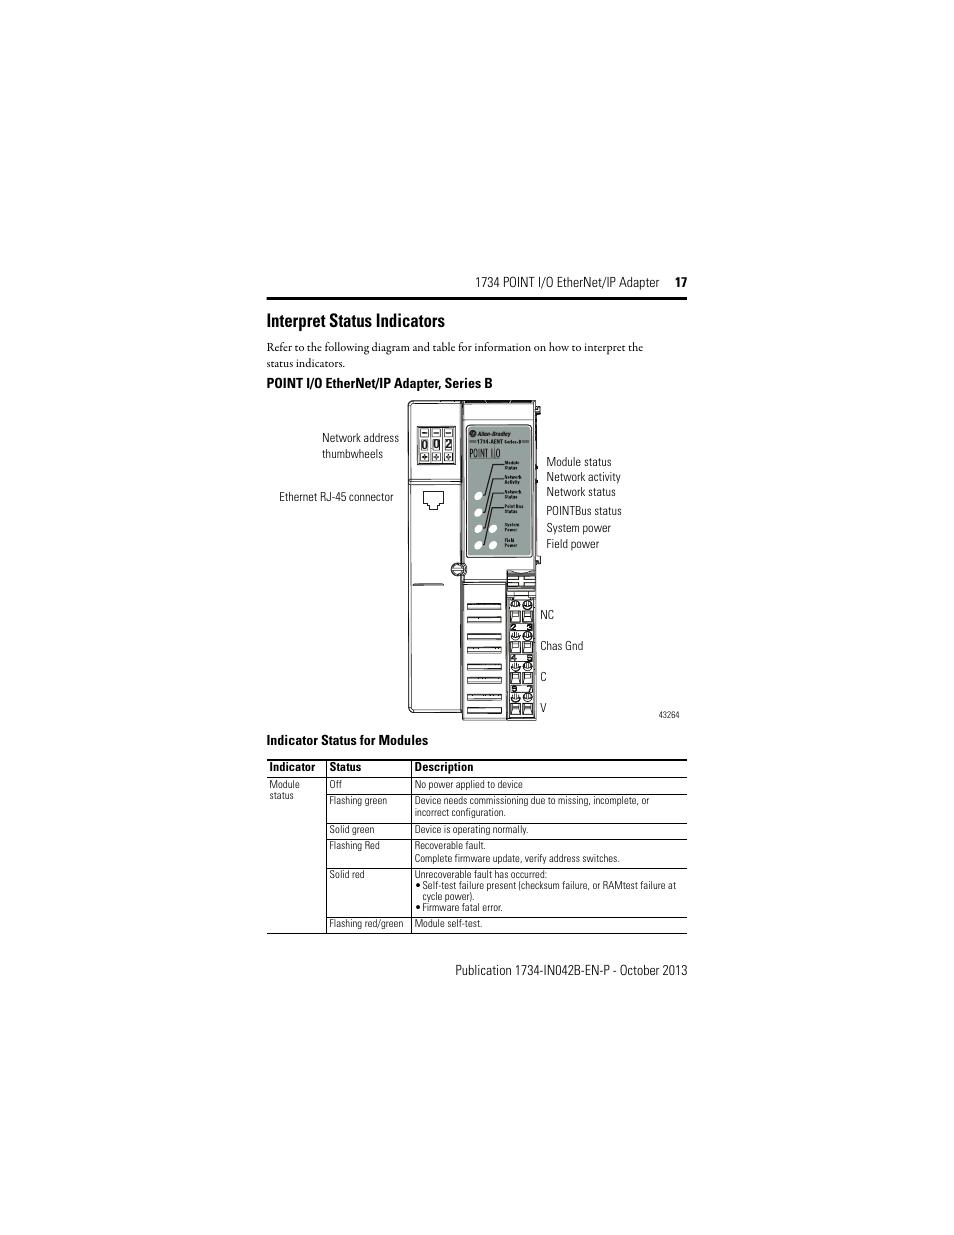 Controlflash firmware upgrade kit user manual.